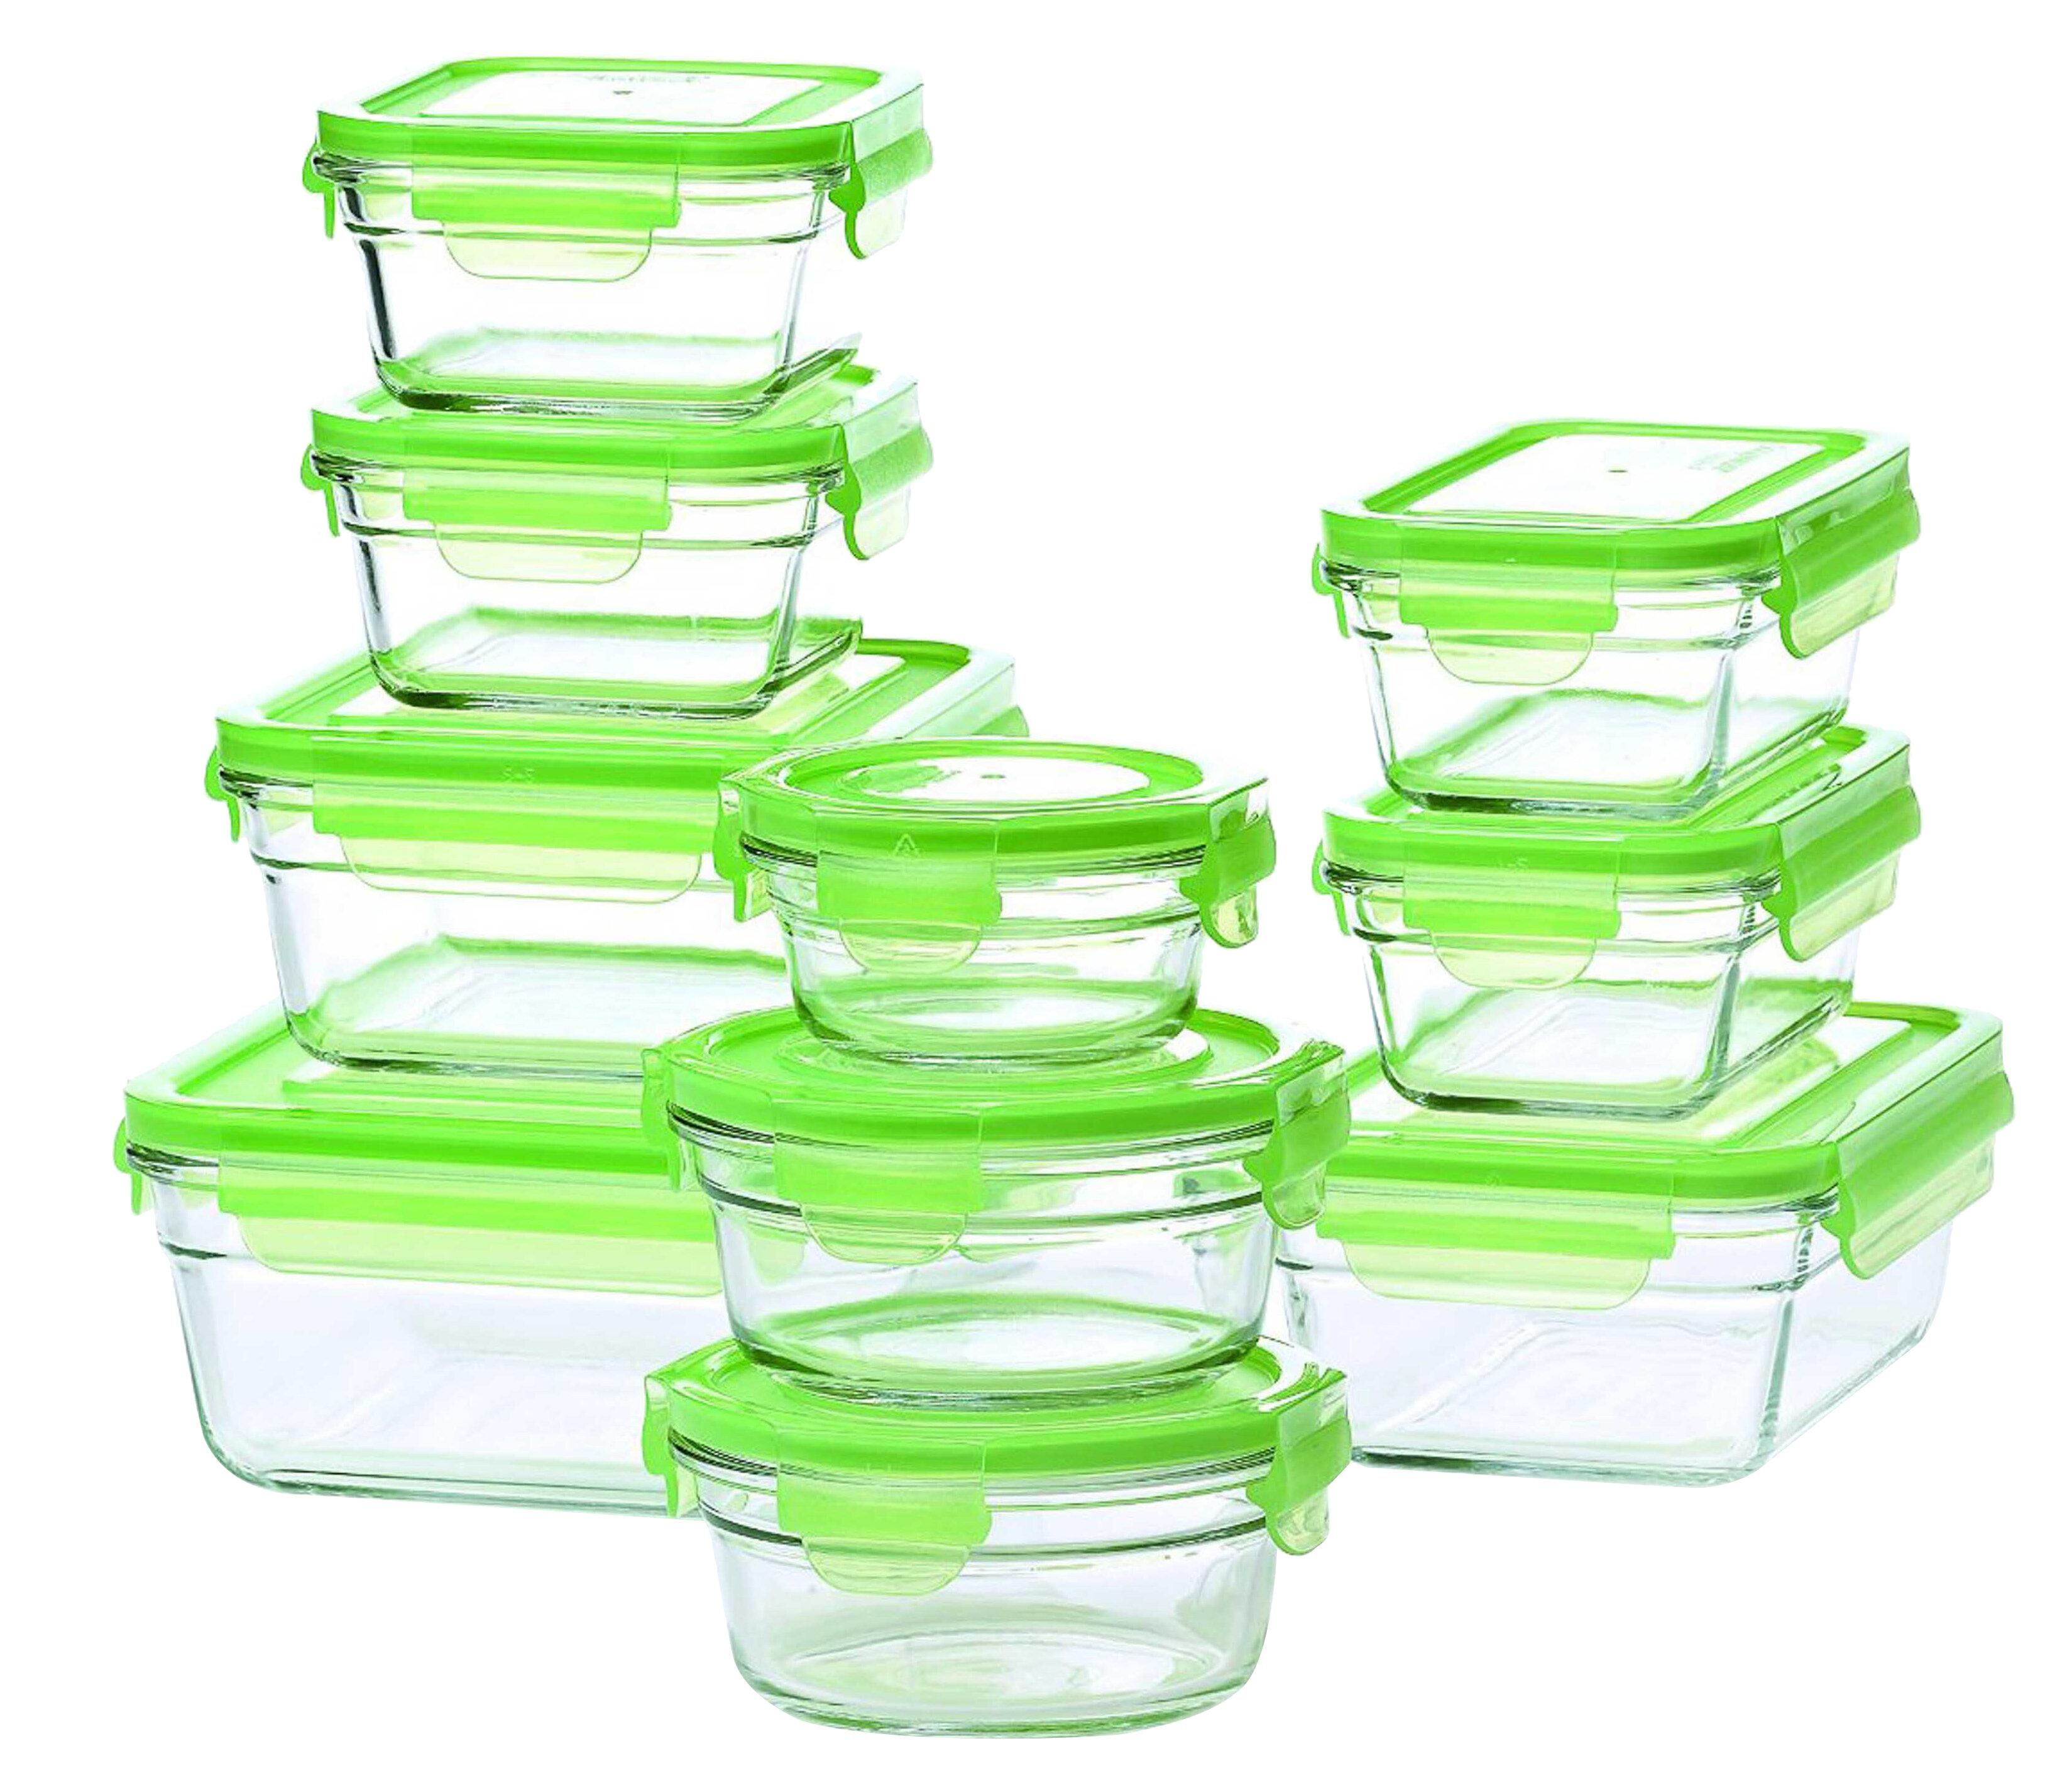 Glasslock Glasslock 10 Container Food Storage Set Reviews Wayfair